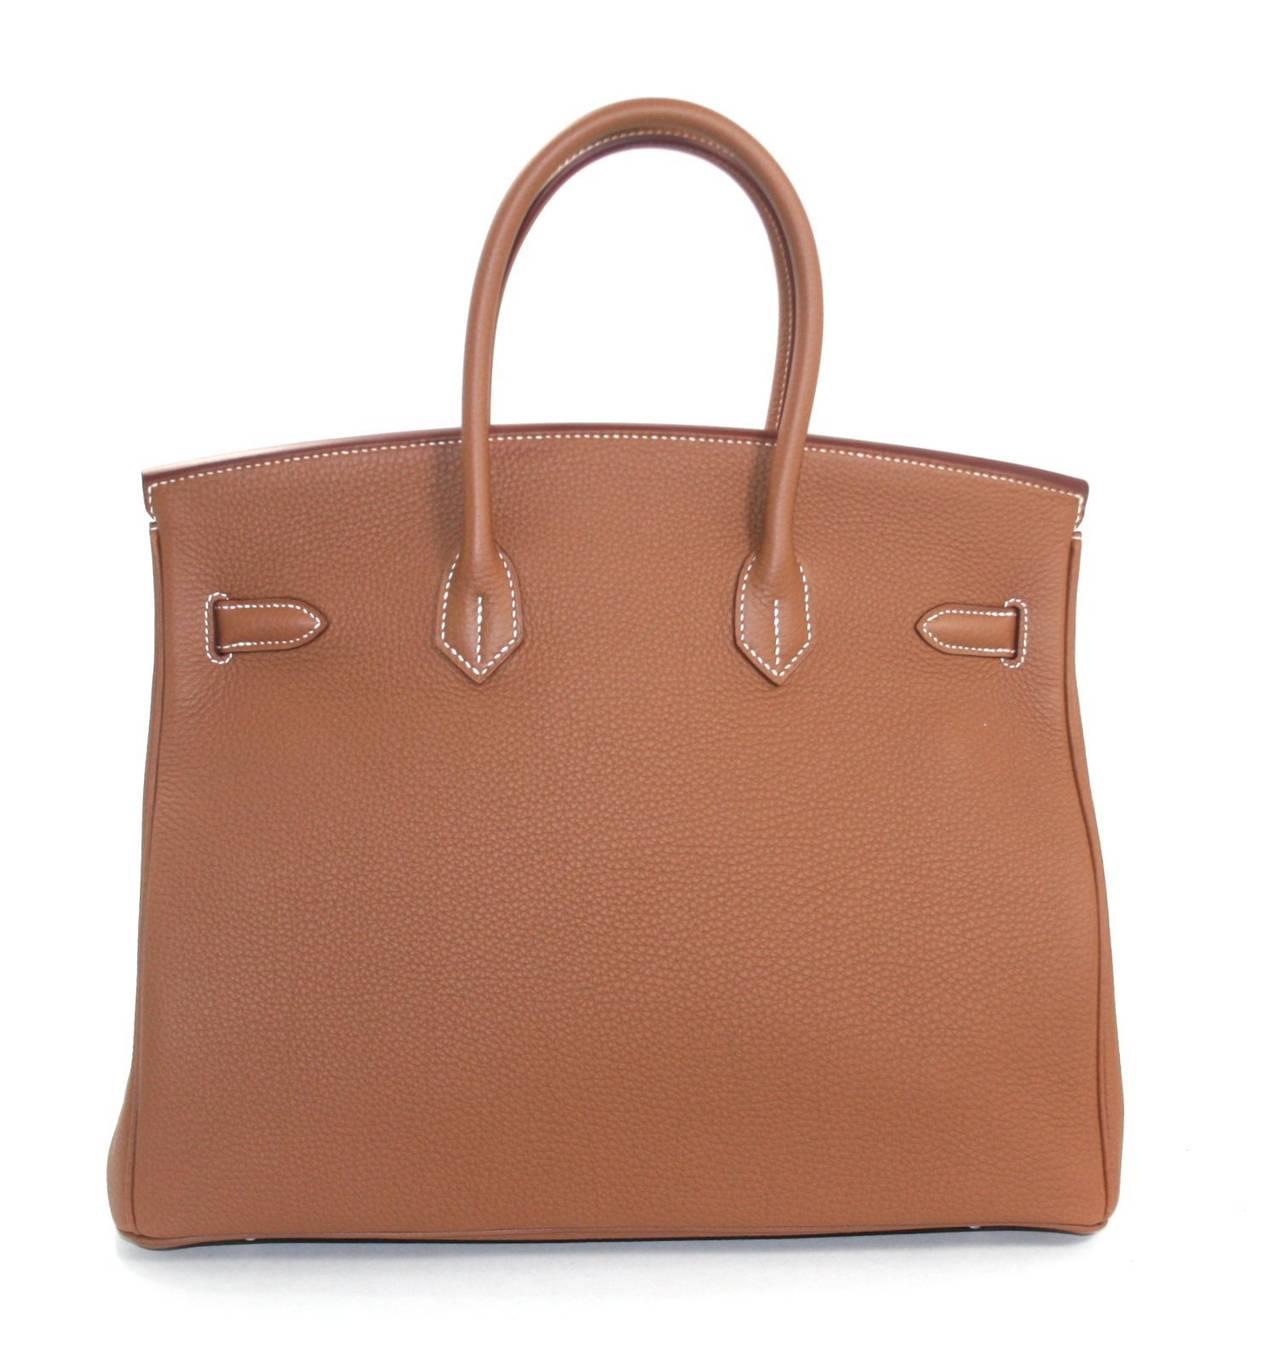 Hermes Birkin Bag in Gold Togo Leather PHW, 35 cm 2